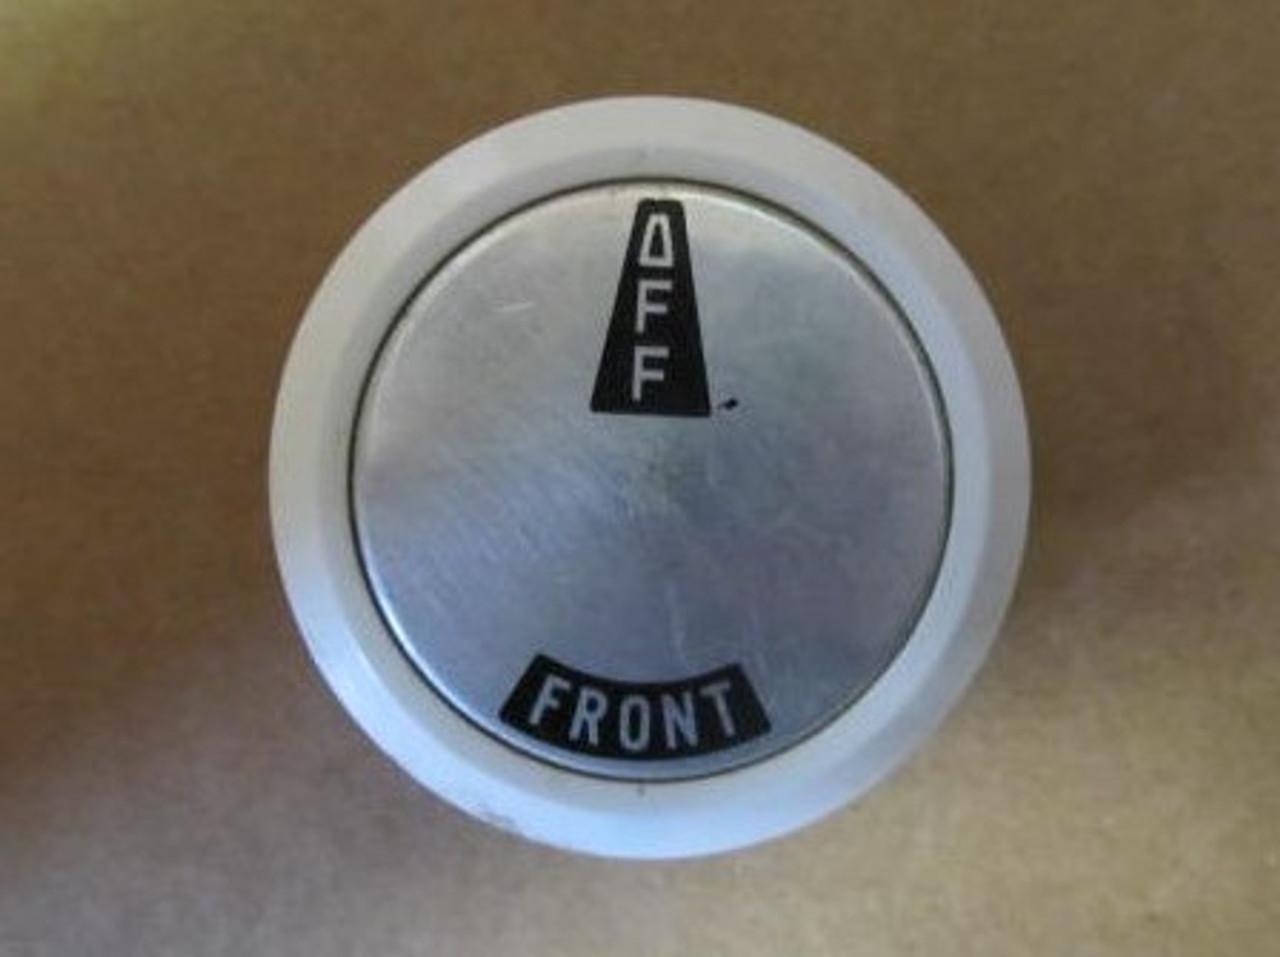 Preway Front Burner Knob (AP114)